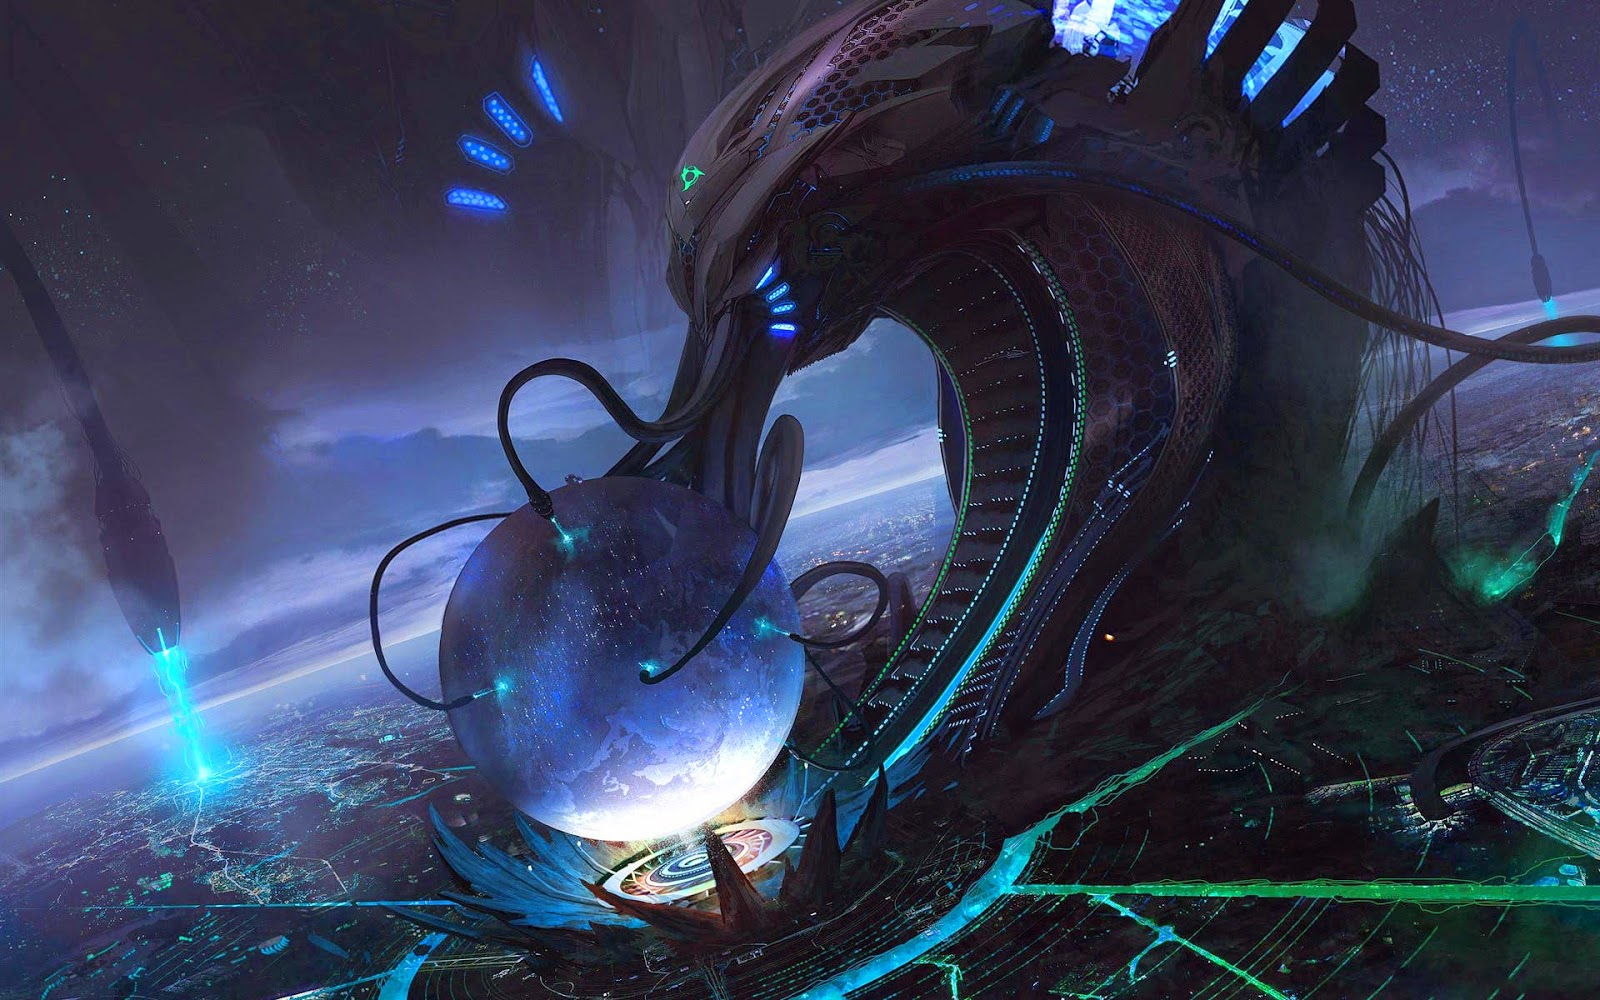 Papel de Parede Ficção Científica Tecnologia Alienígena para pc hd 3d grátis Sci Fi desktop hd wallpaper image free